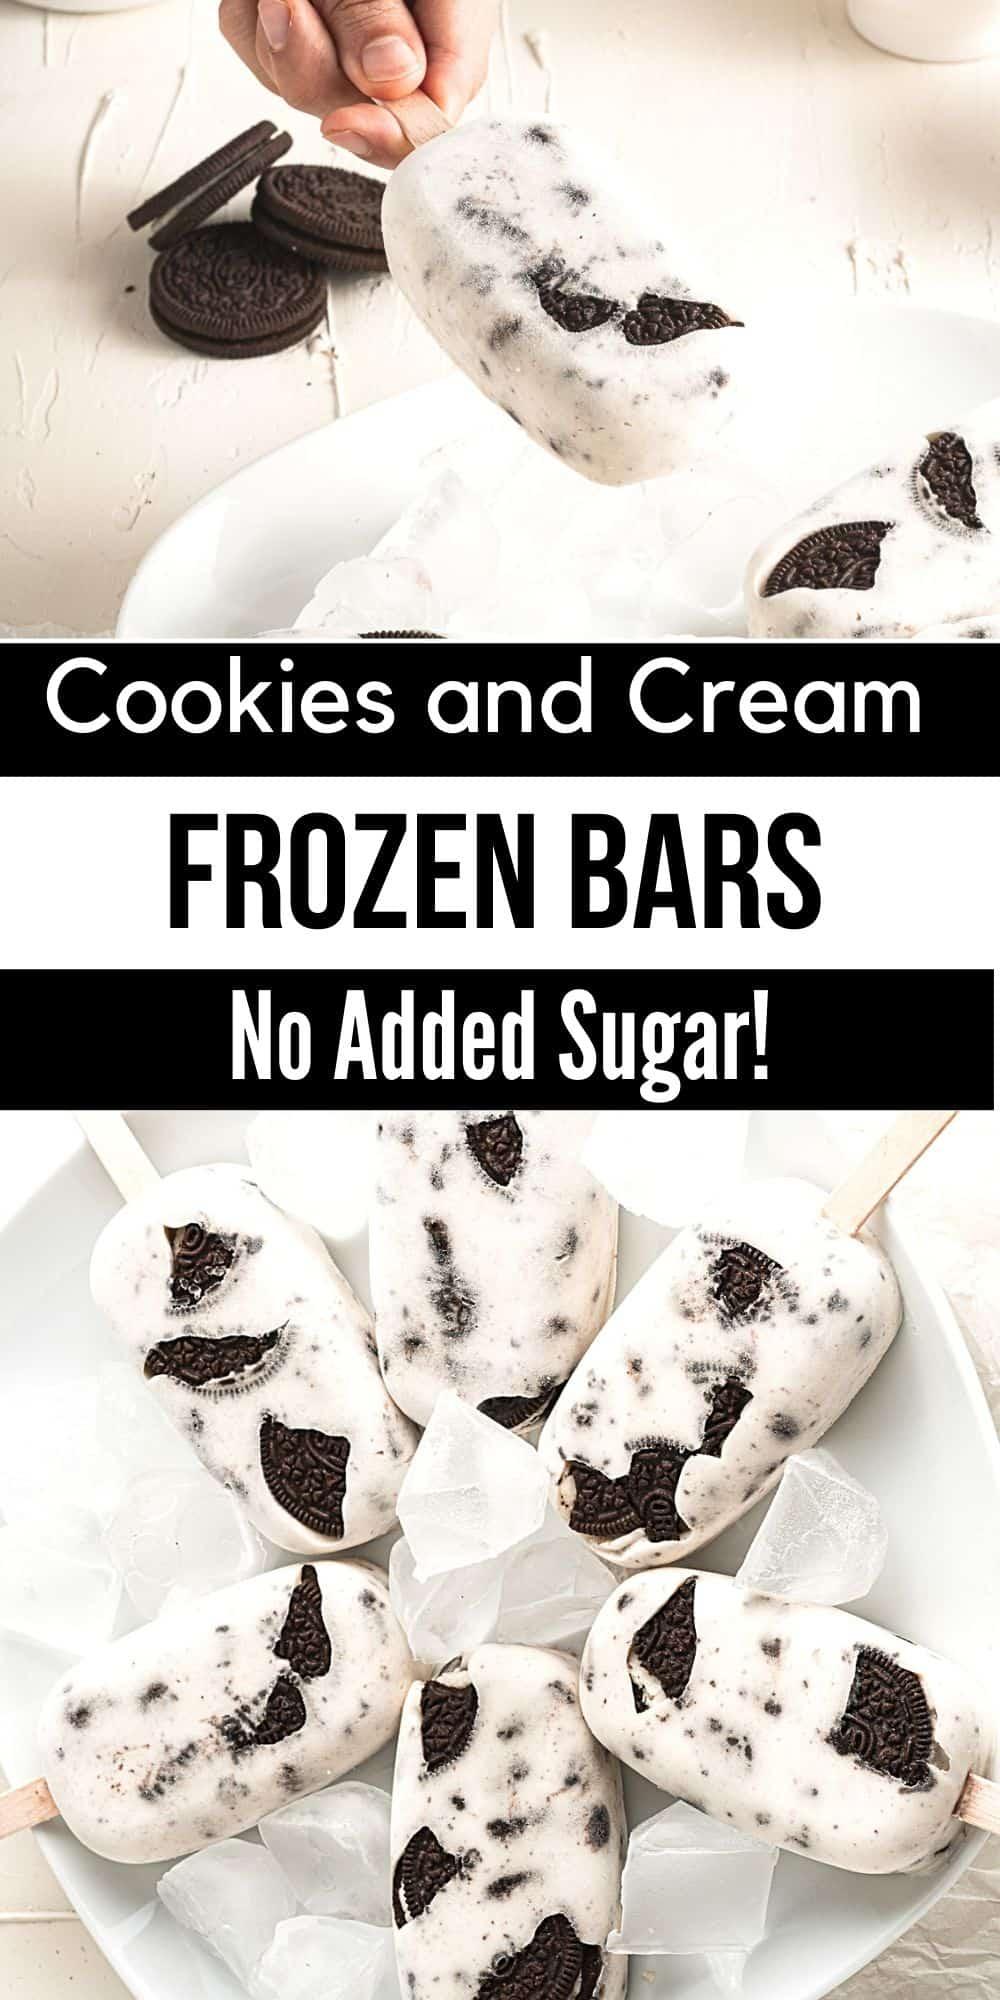 Sugar Free Cookies and Cream Bars